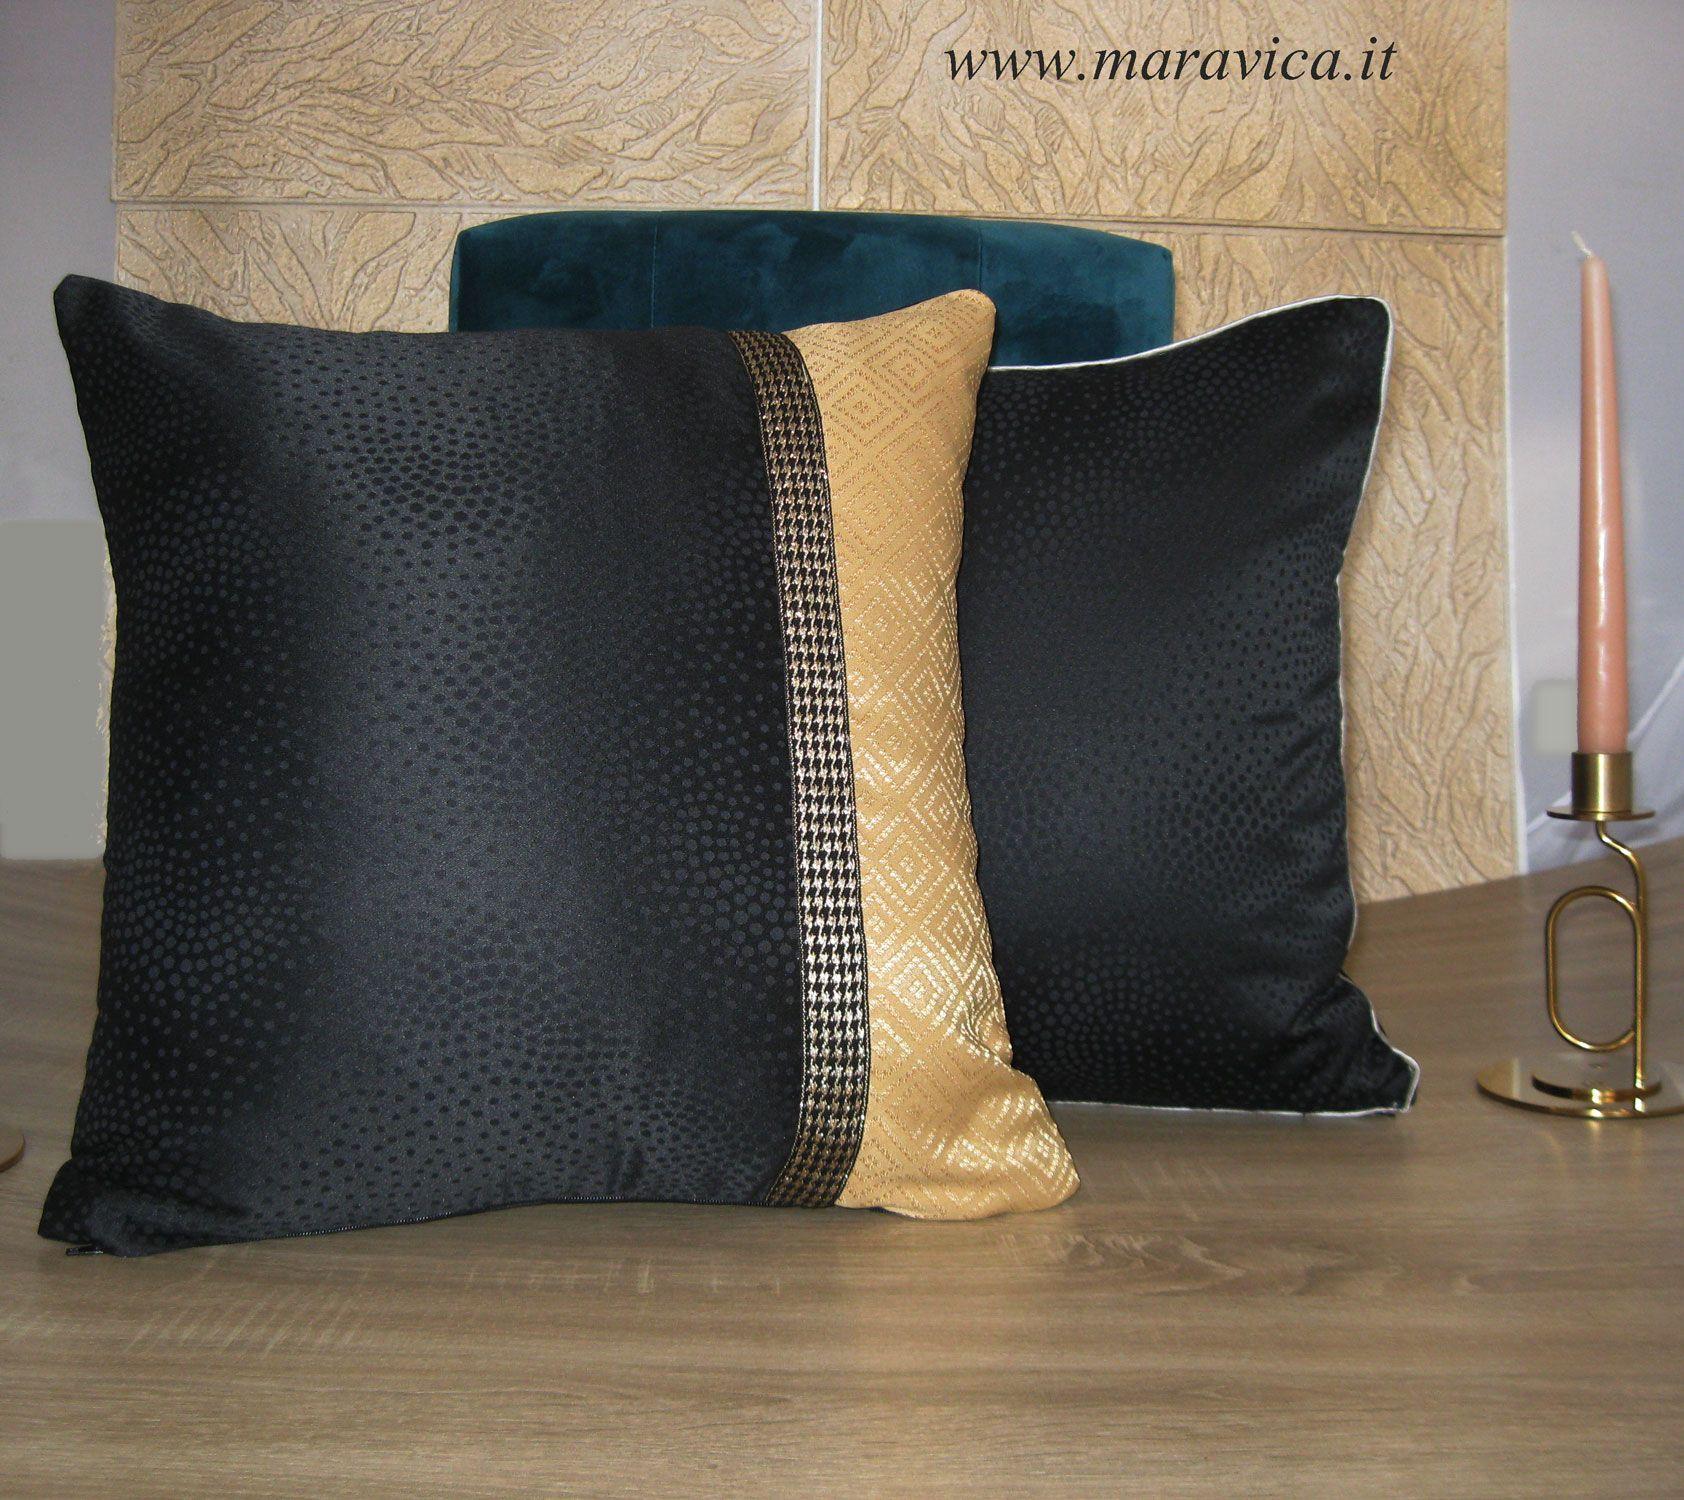 Cuscini Moderni Per Divano.Cuscini Arredo Per Divani Moderni Home Couture Made In Italy